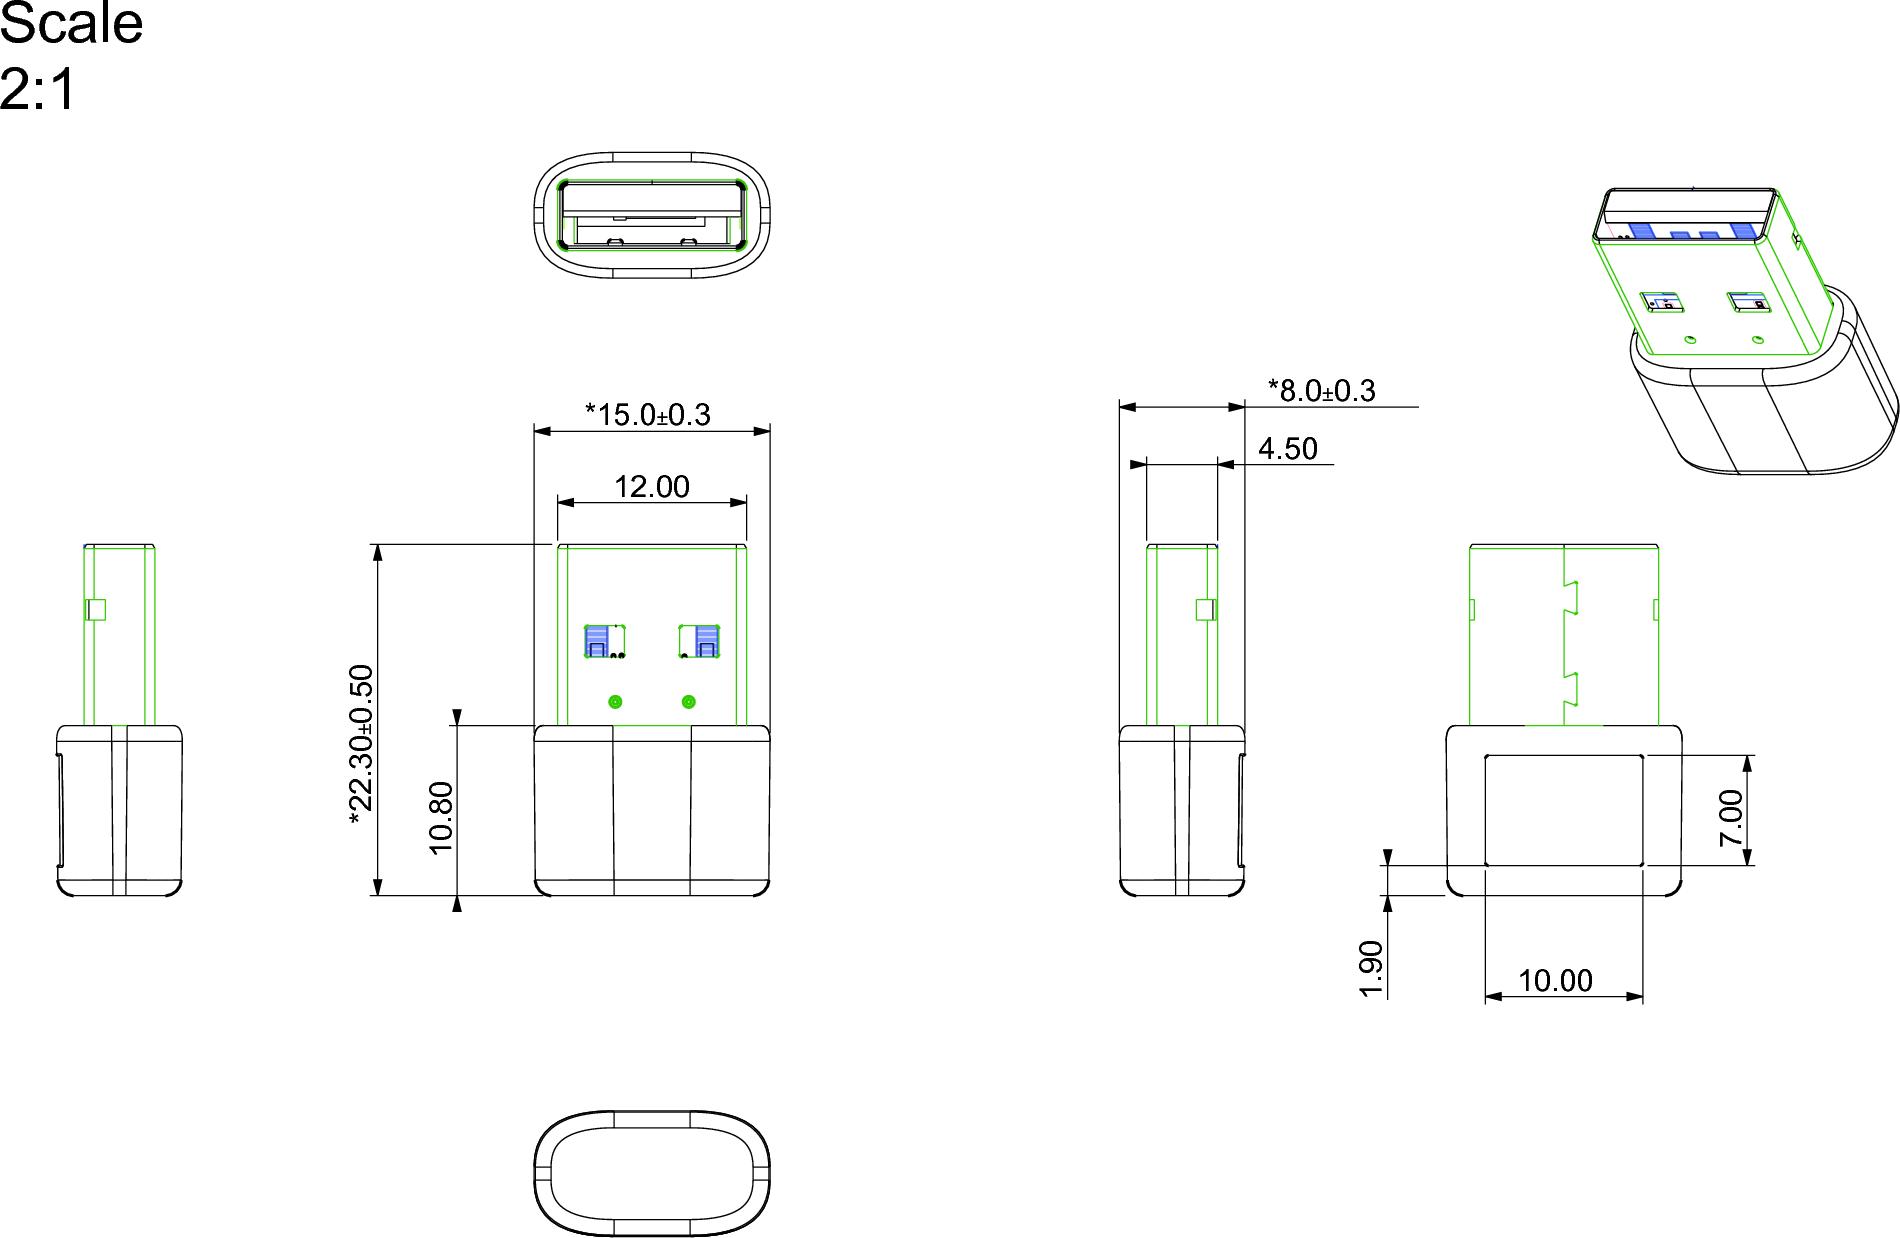 Cc And C Technologies Inc Wlan Usb Adapter N93 Pan N93